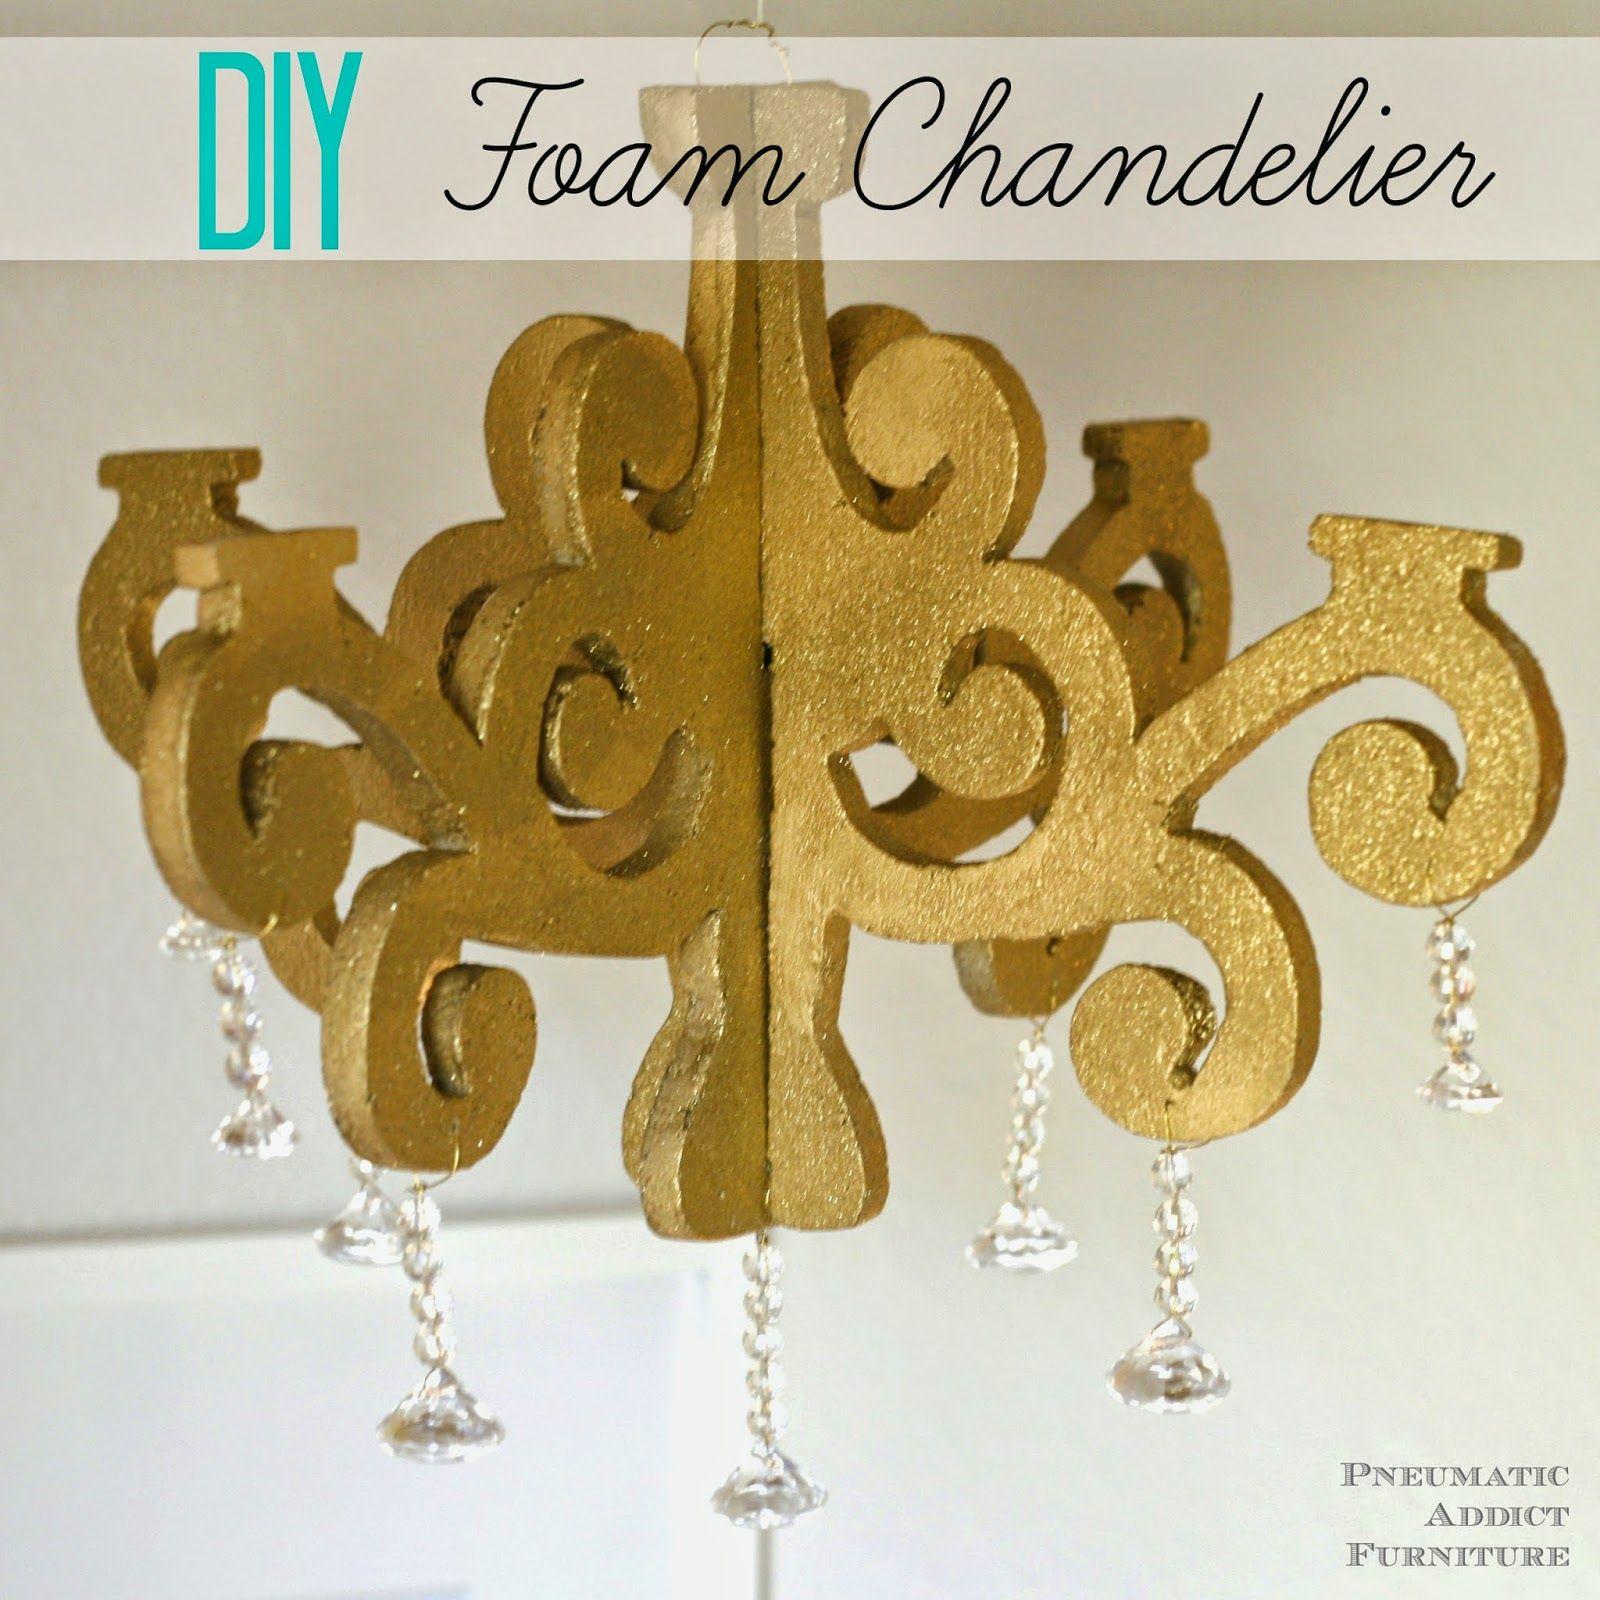 Diy foam chandelier giveaway diy chandelier craft foam and make your own diy chandelier using inexpensive craft foam step by step photo tutorial bildanleitung aloadofball Gallery